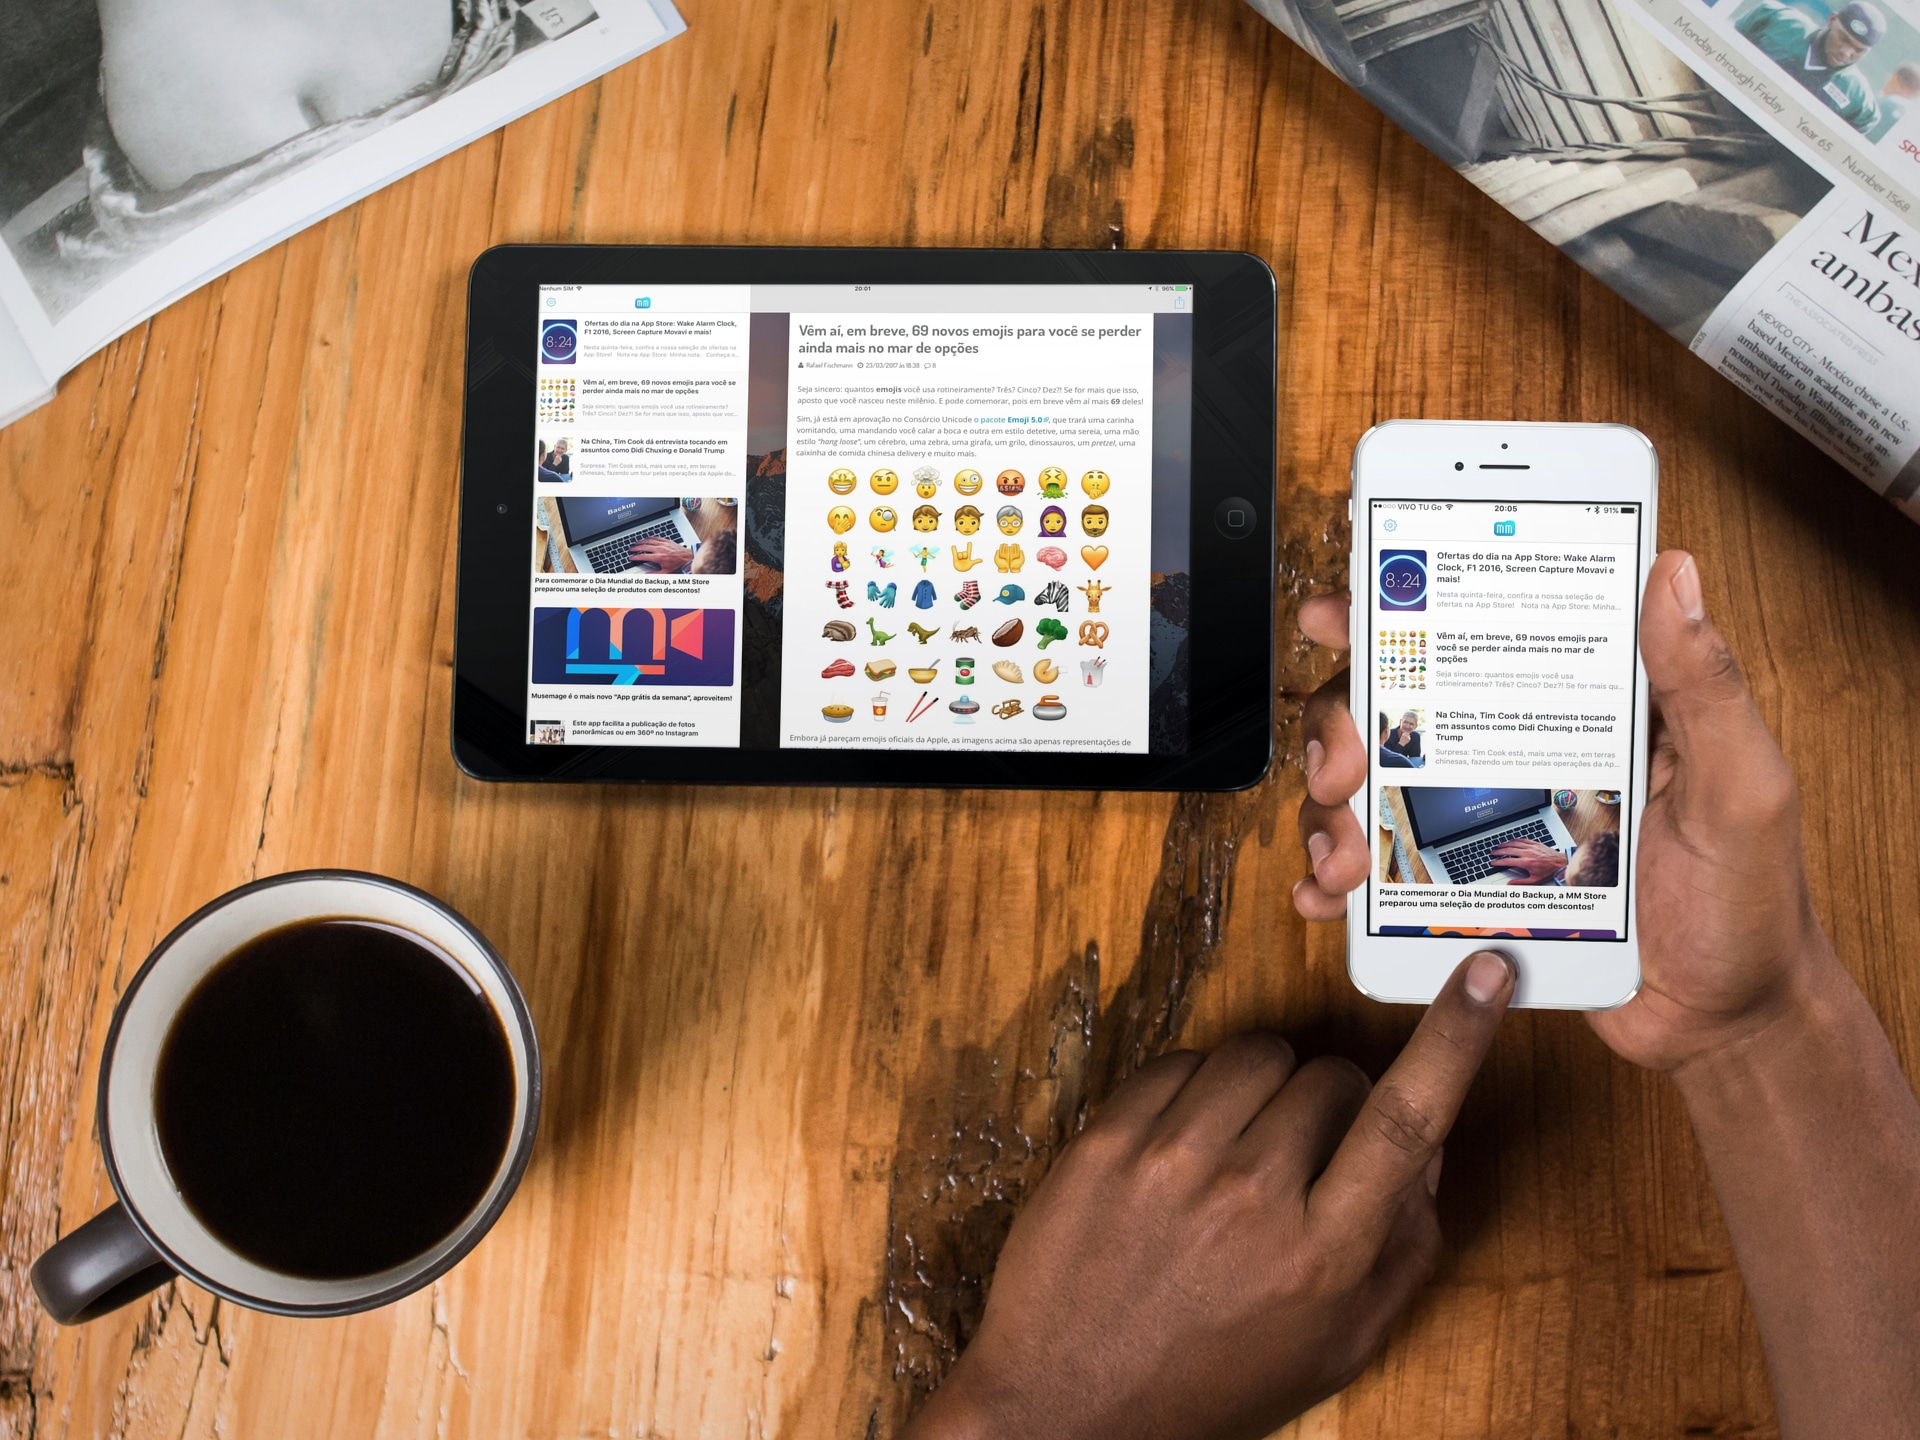 App MacMagazine 3.1 para iPad e iPhone